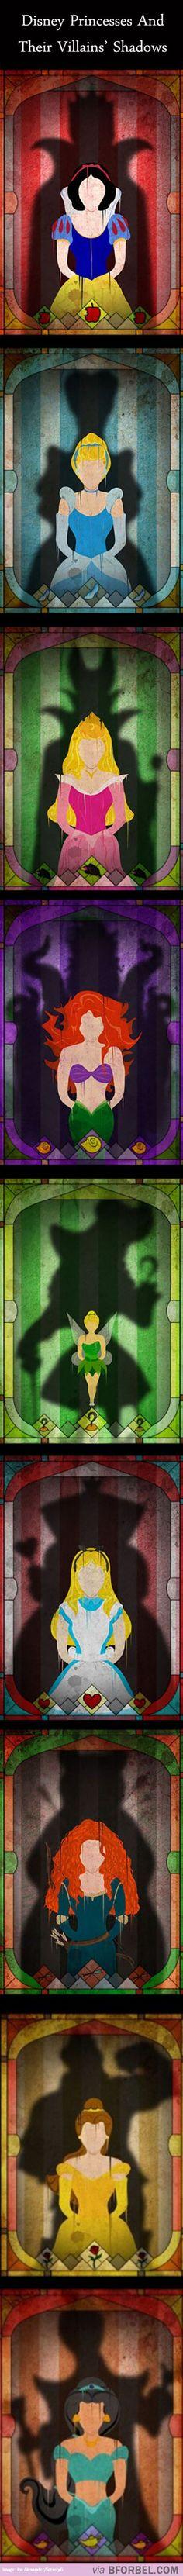 Disney princess and theirs villain´s shadows ^^